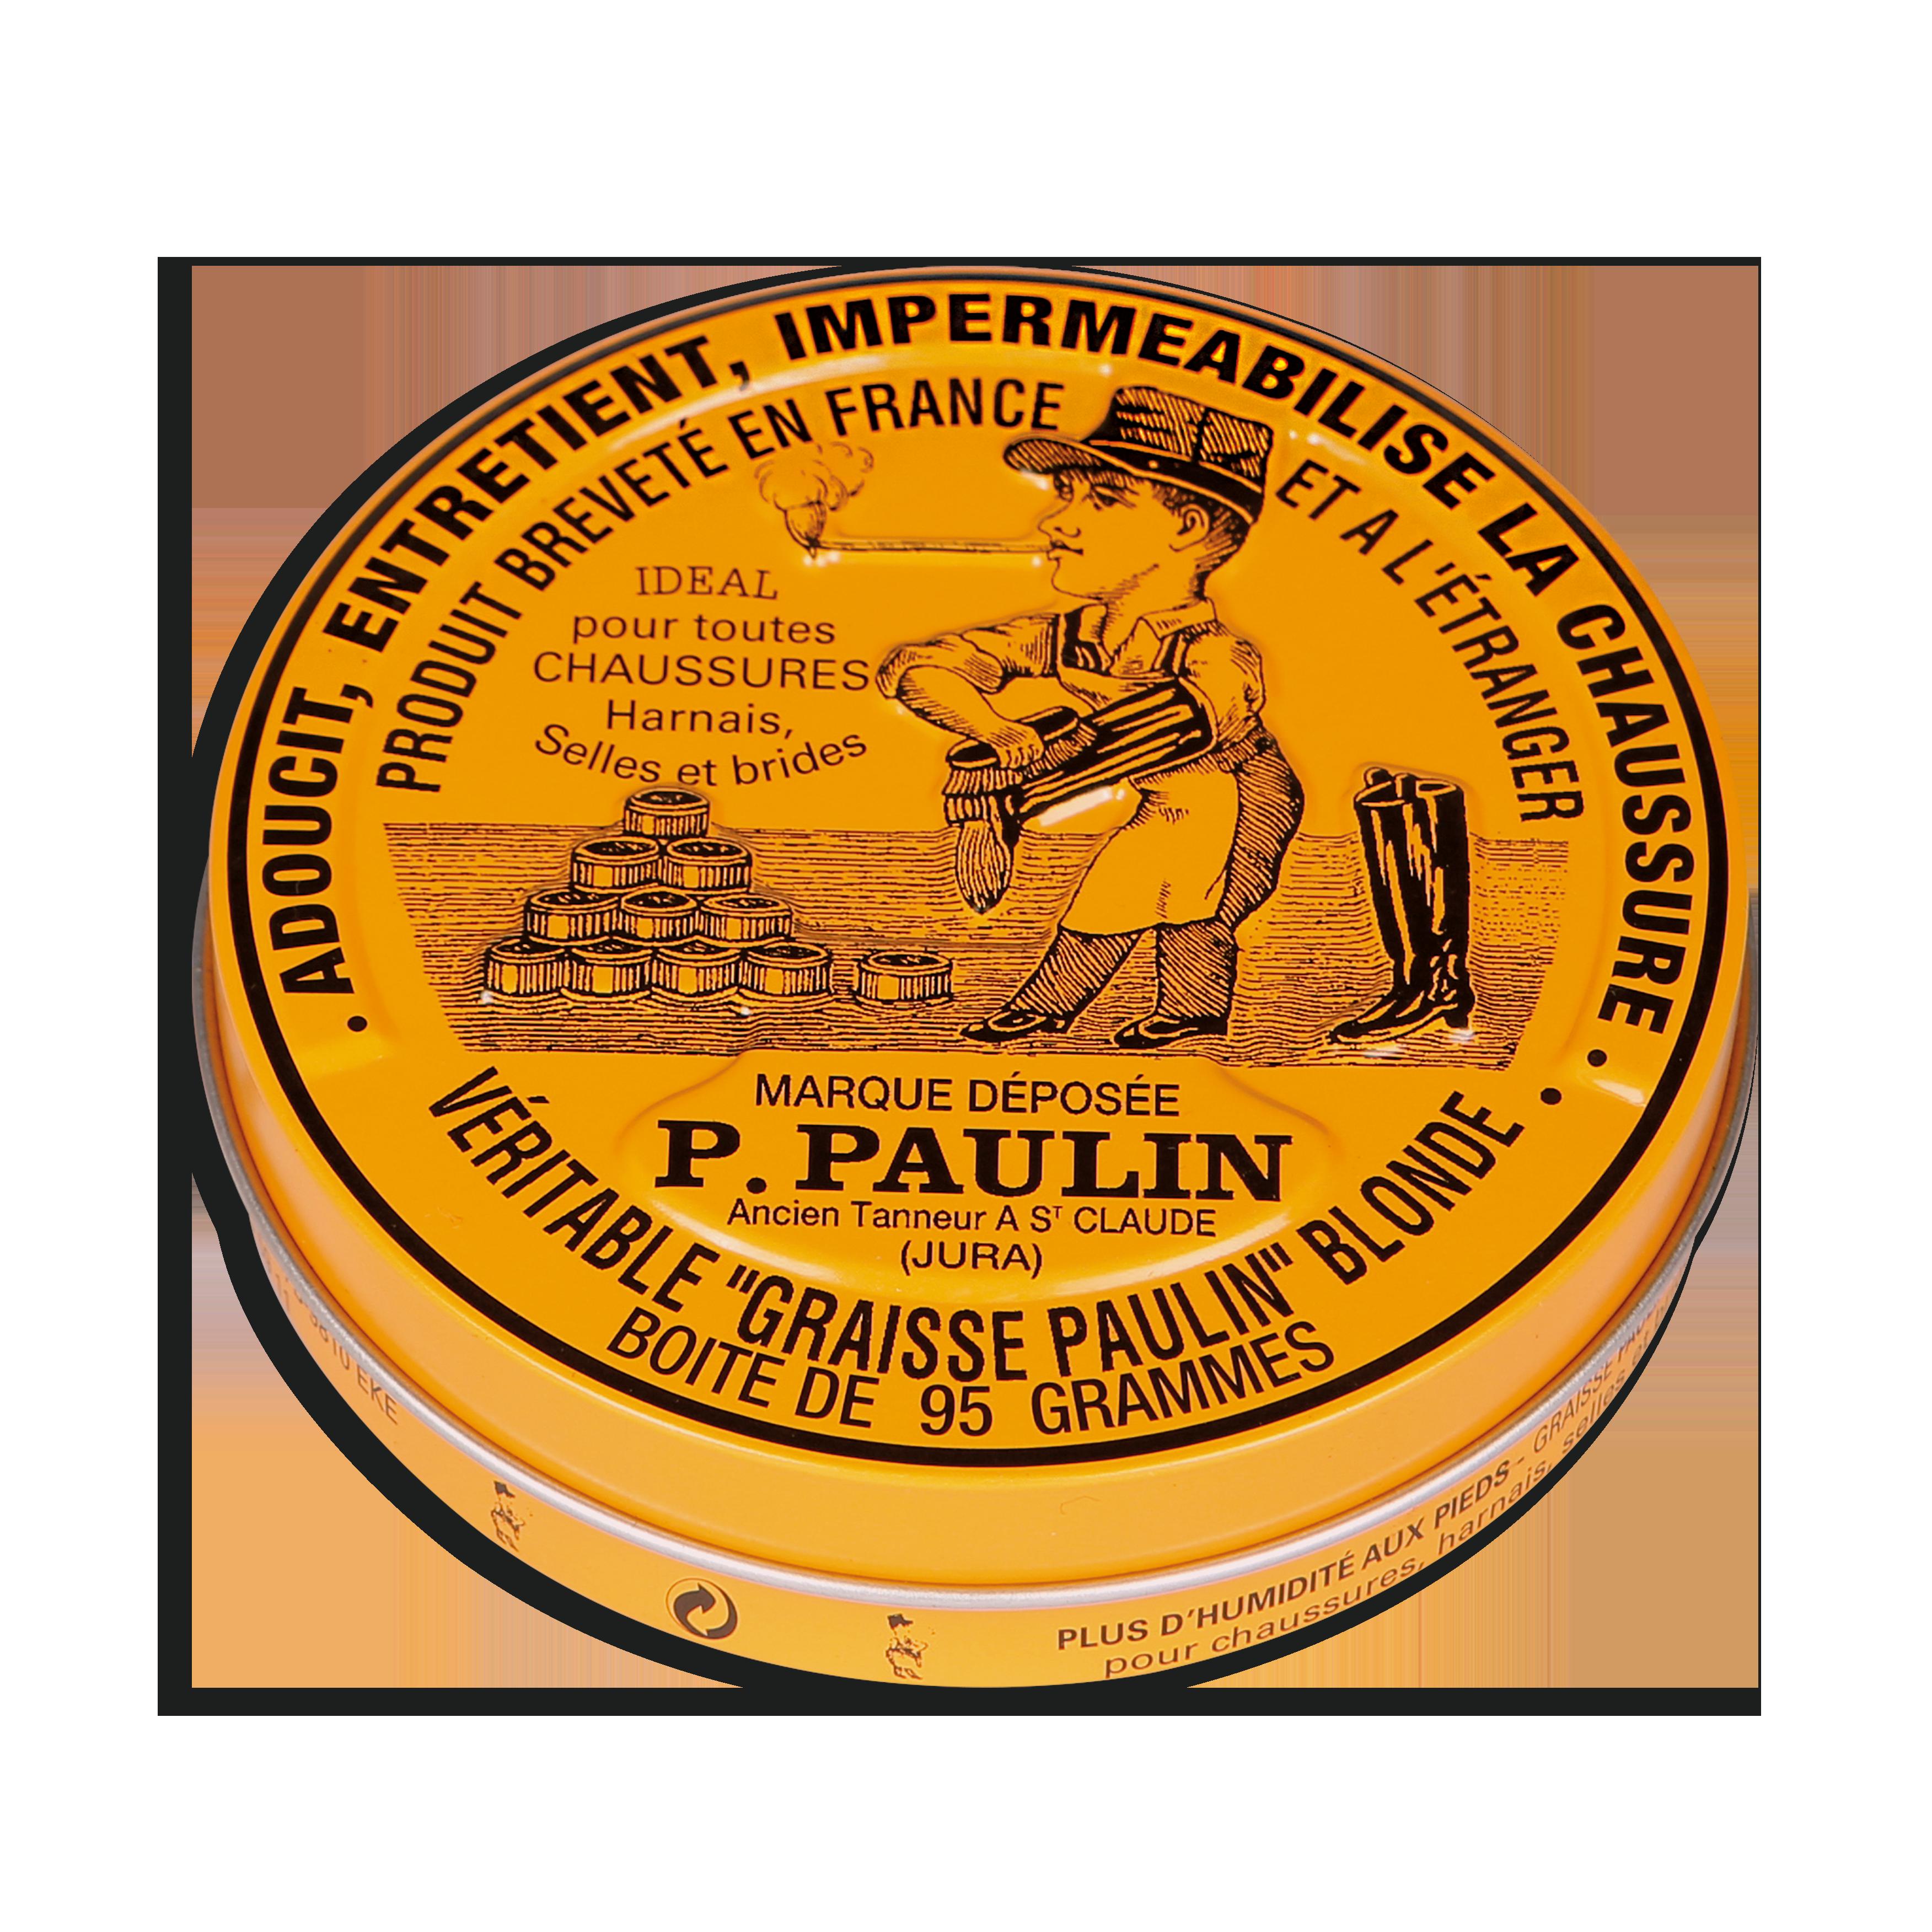 GRAISSE PAULIN BLONDE